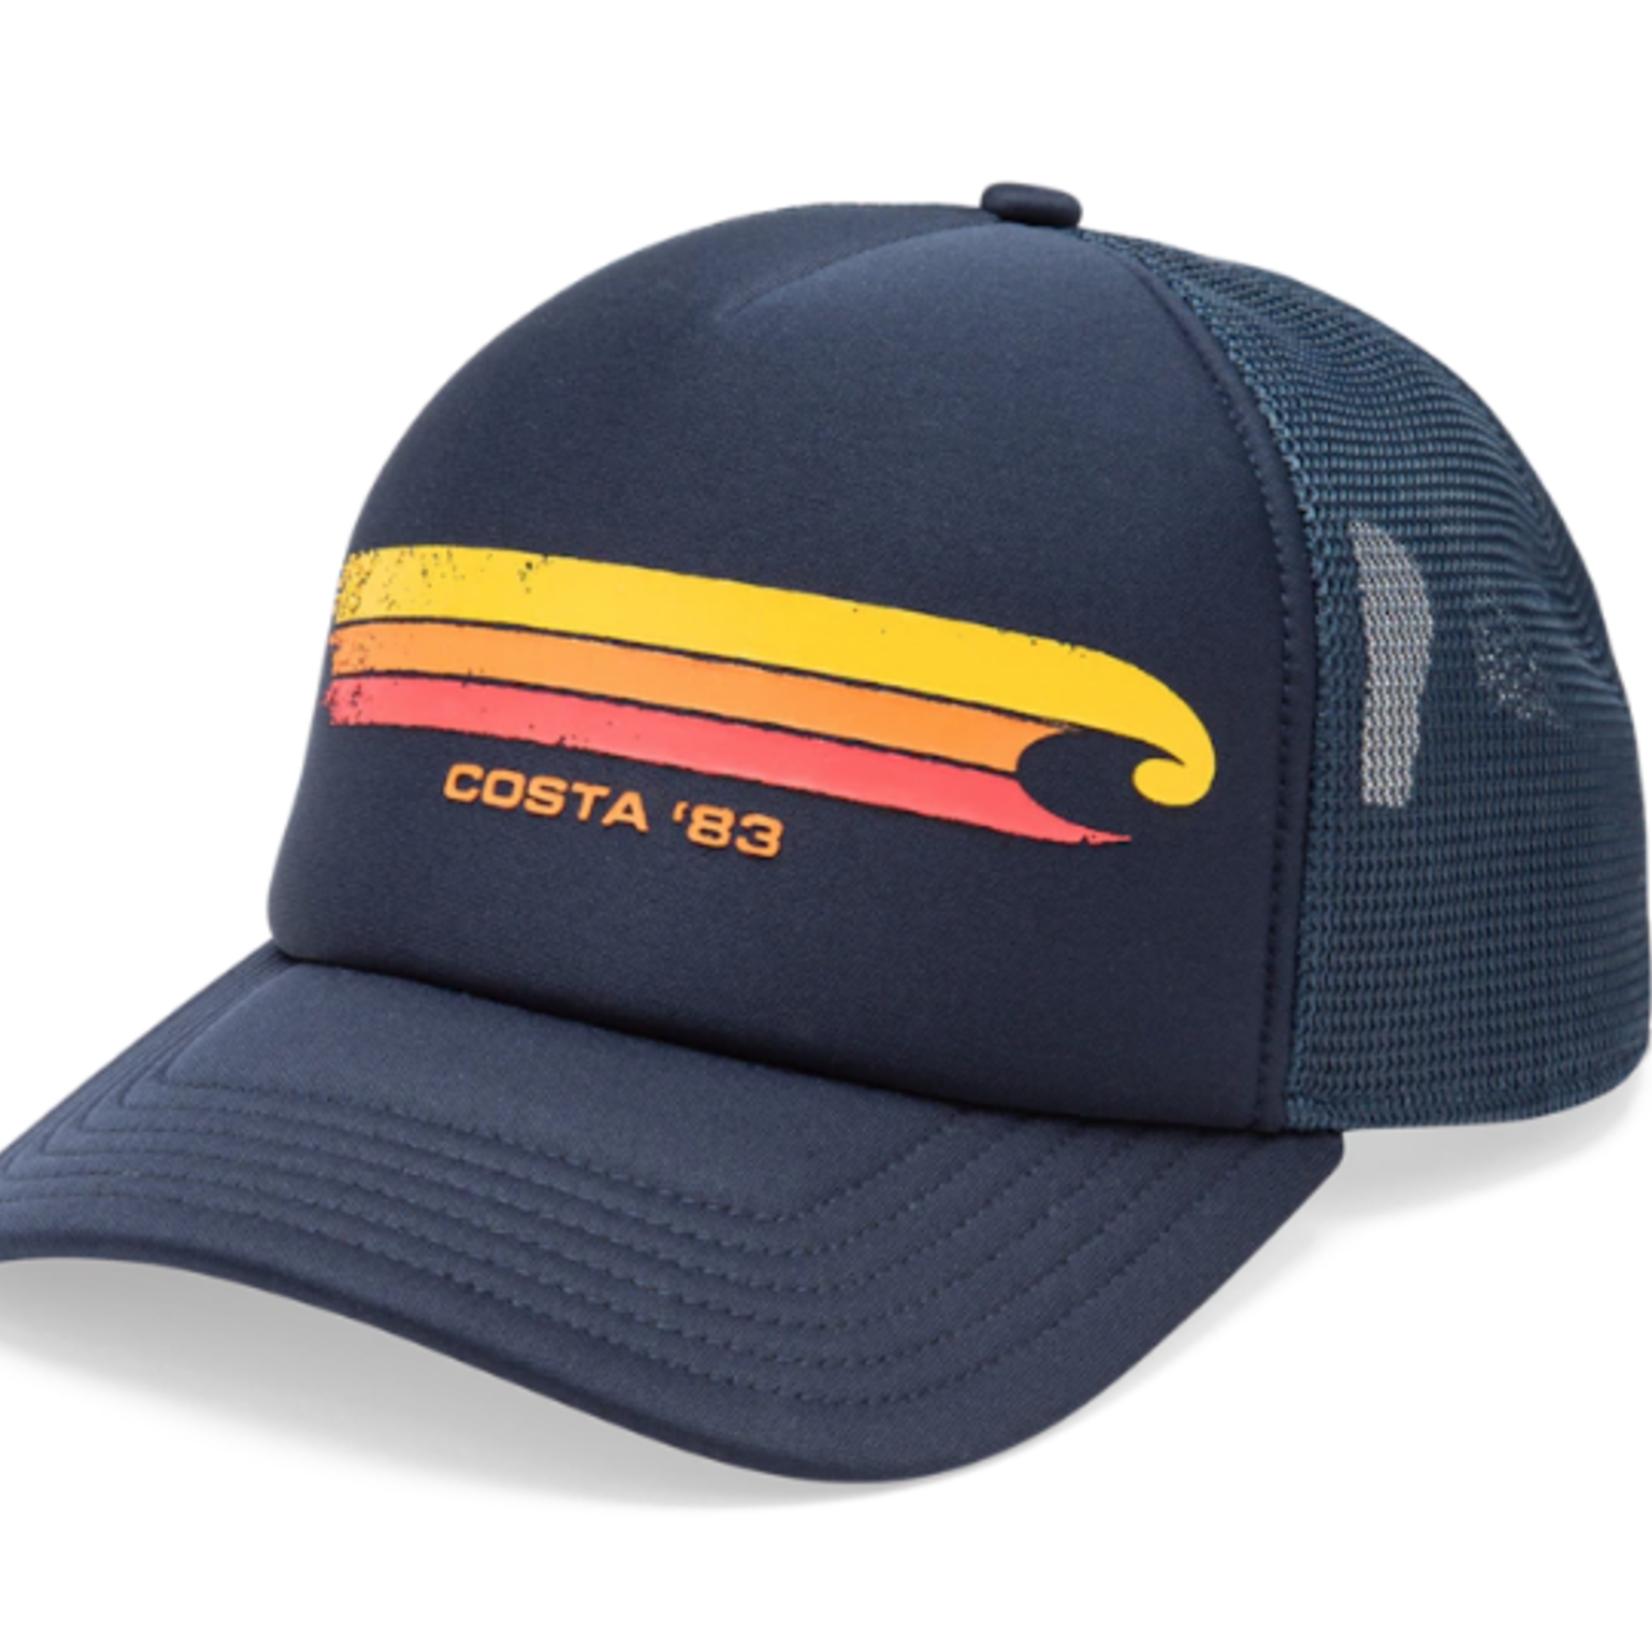 Costa Costa Hang Loose Foam Trucker-Navy-O/S